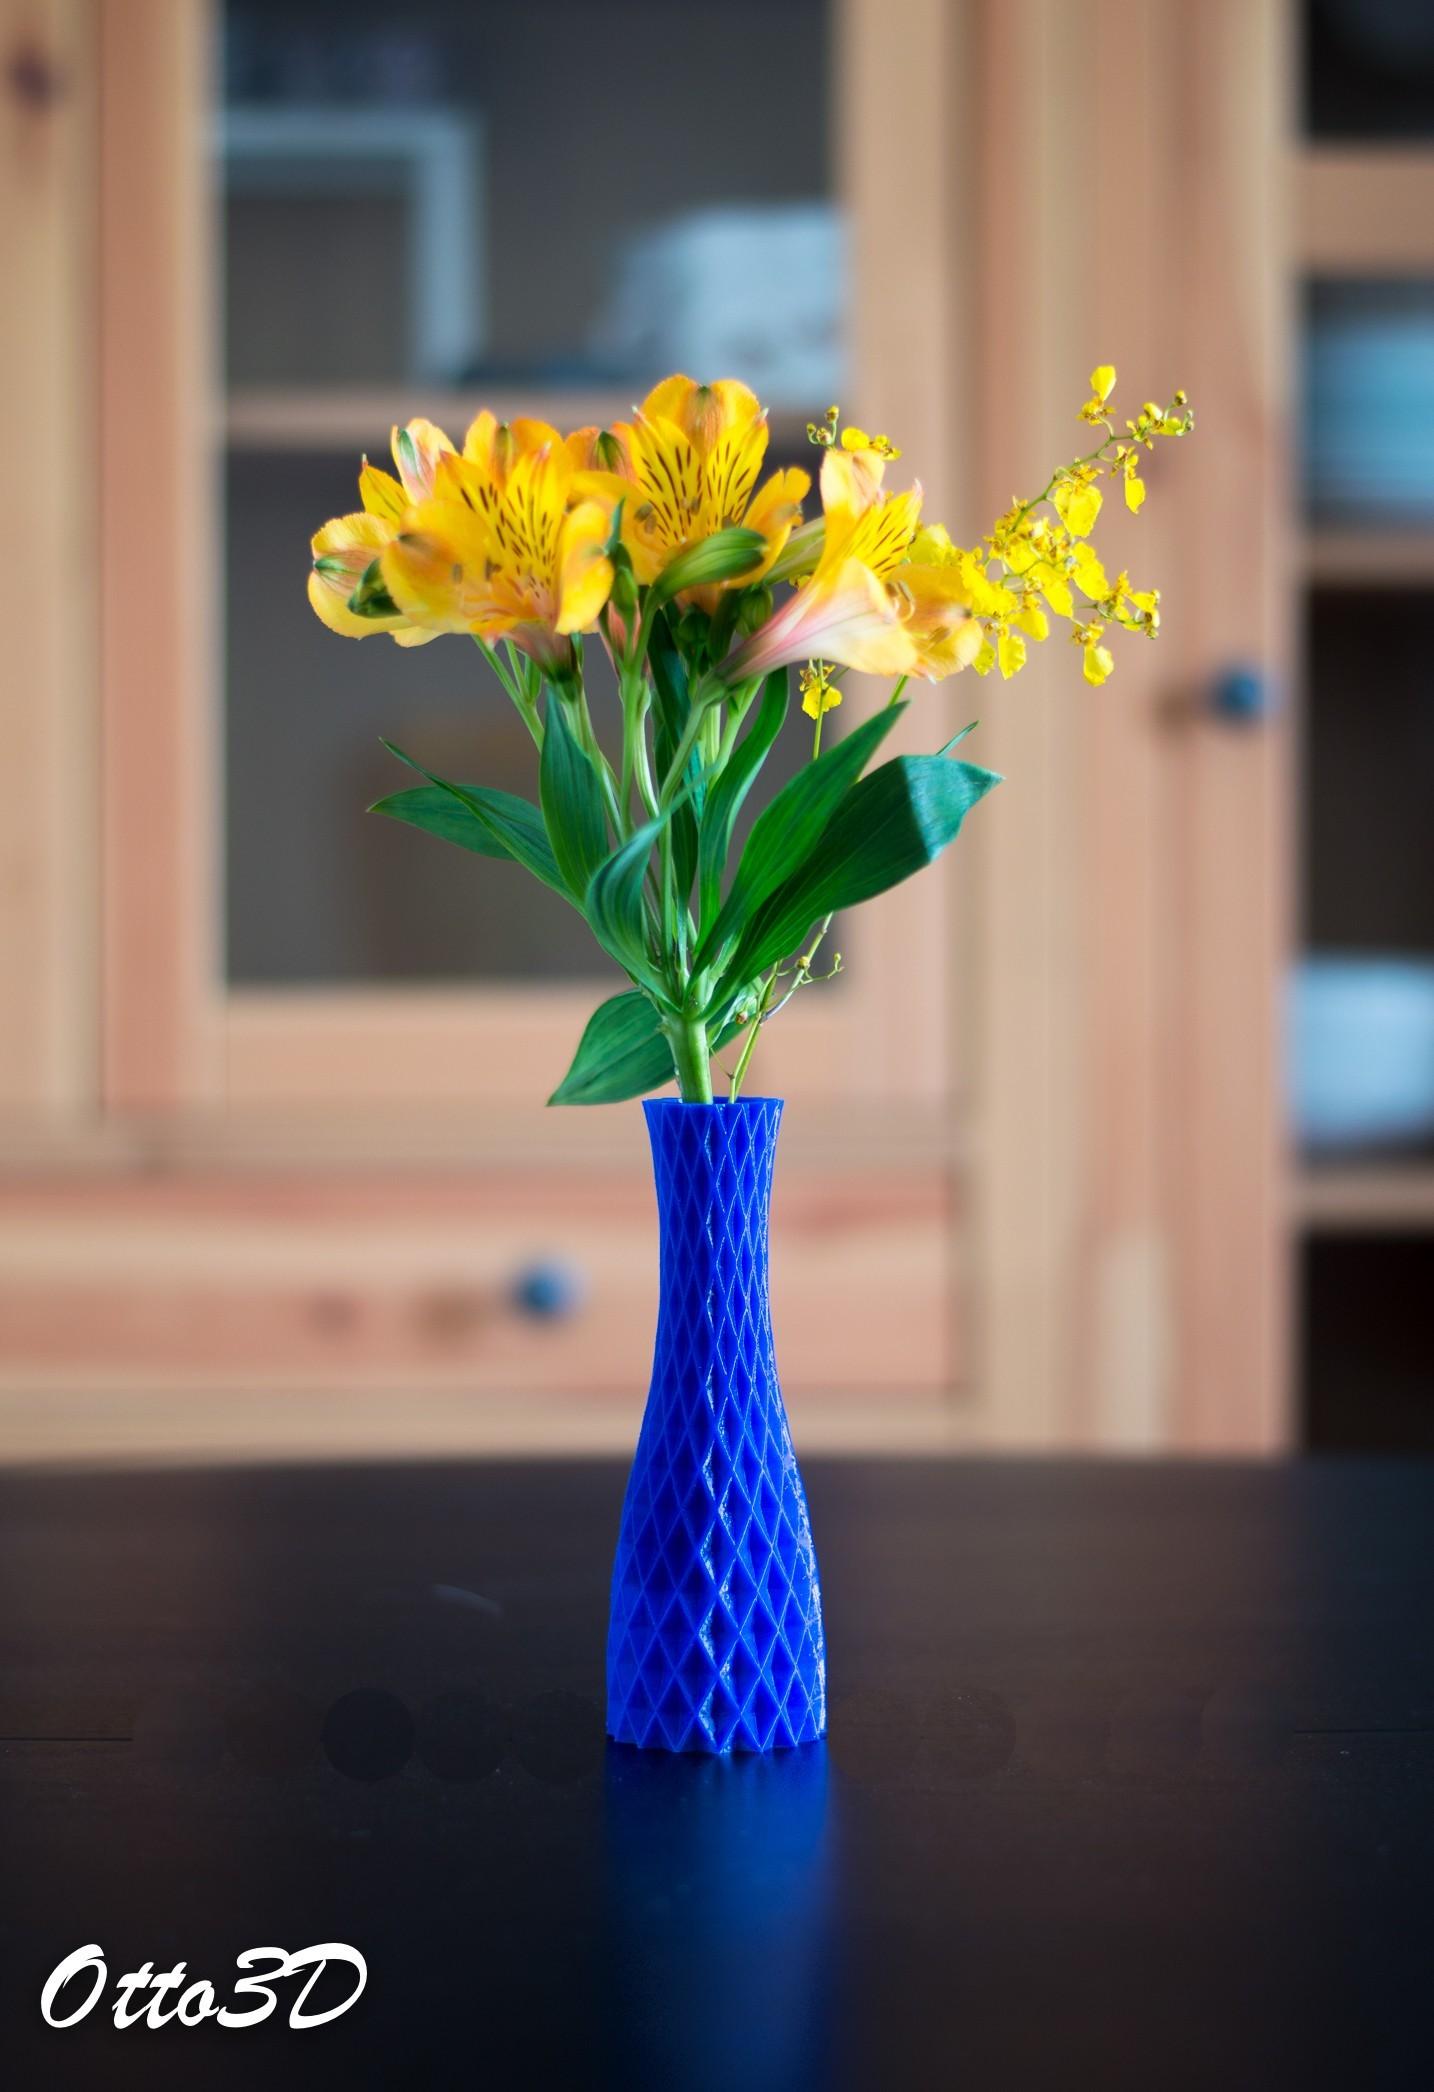 Vaso Trançado.jpg Download free STL file Vase 180 • Model to 3D print, OTTO3D